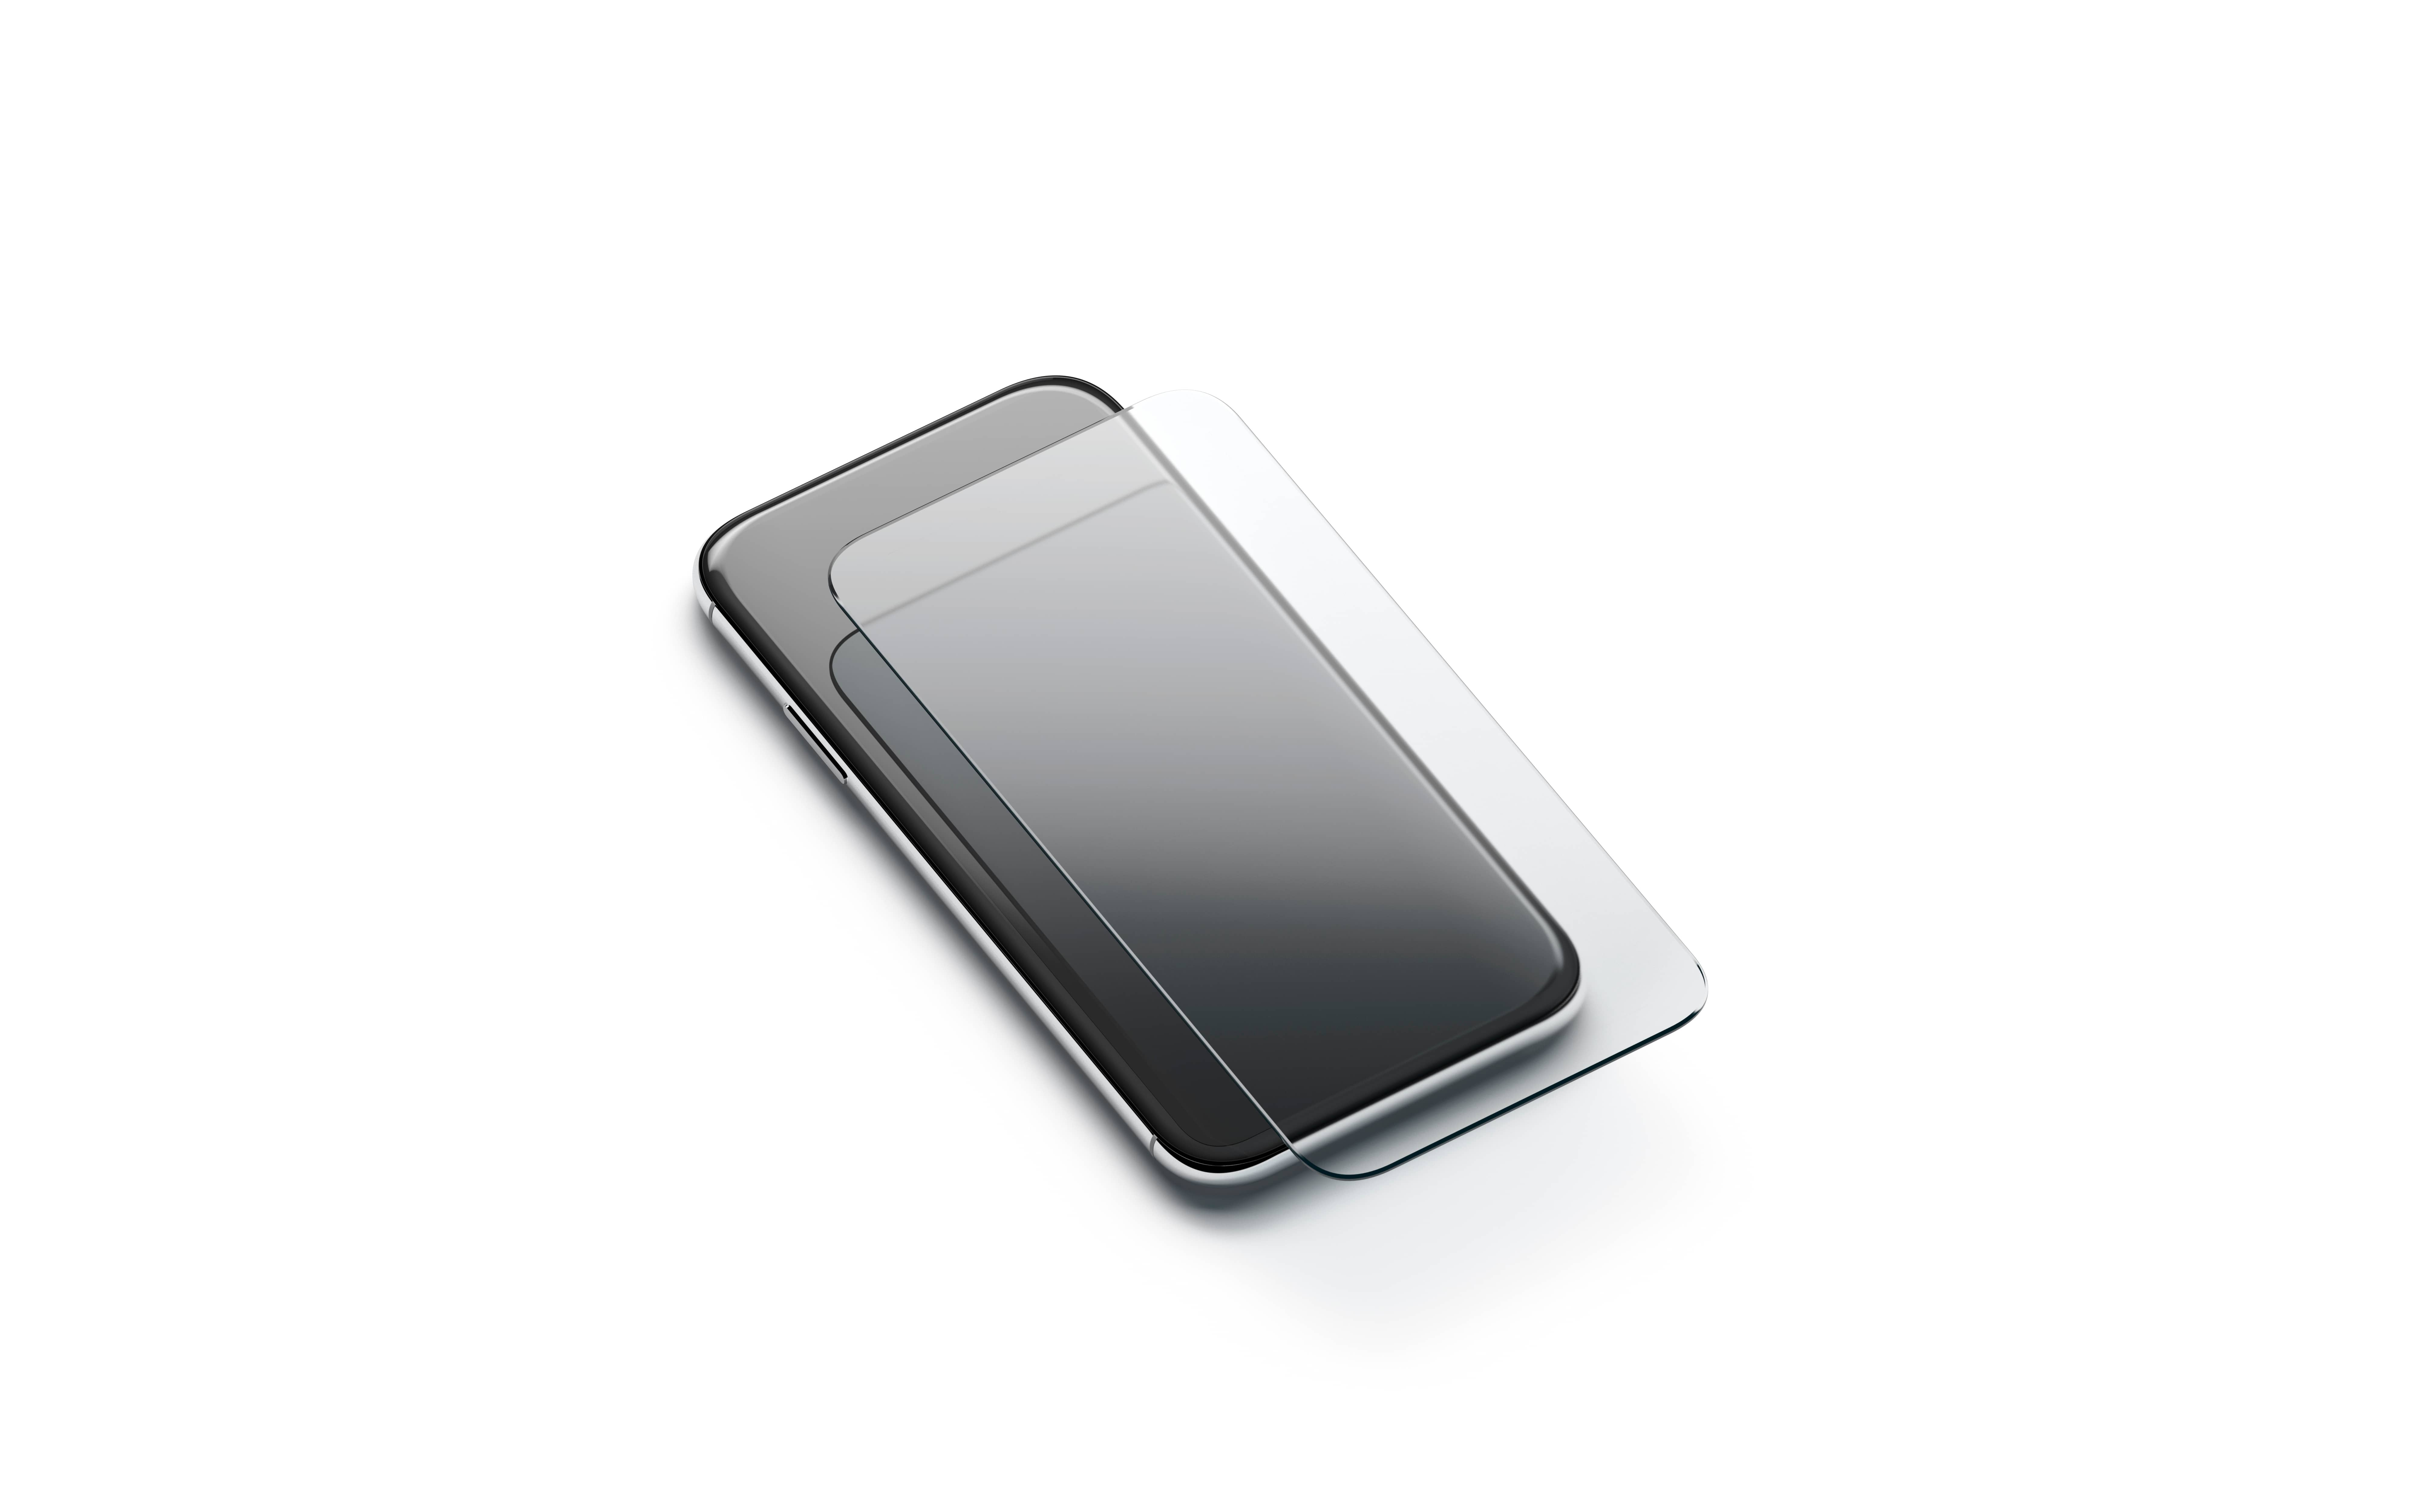 Защита своими руками: как наклеить стекло на экран смартфона